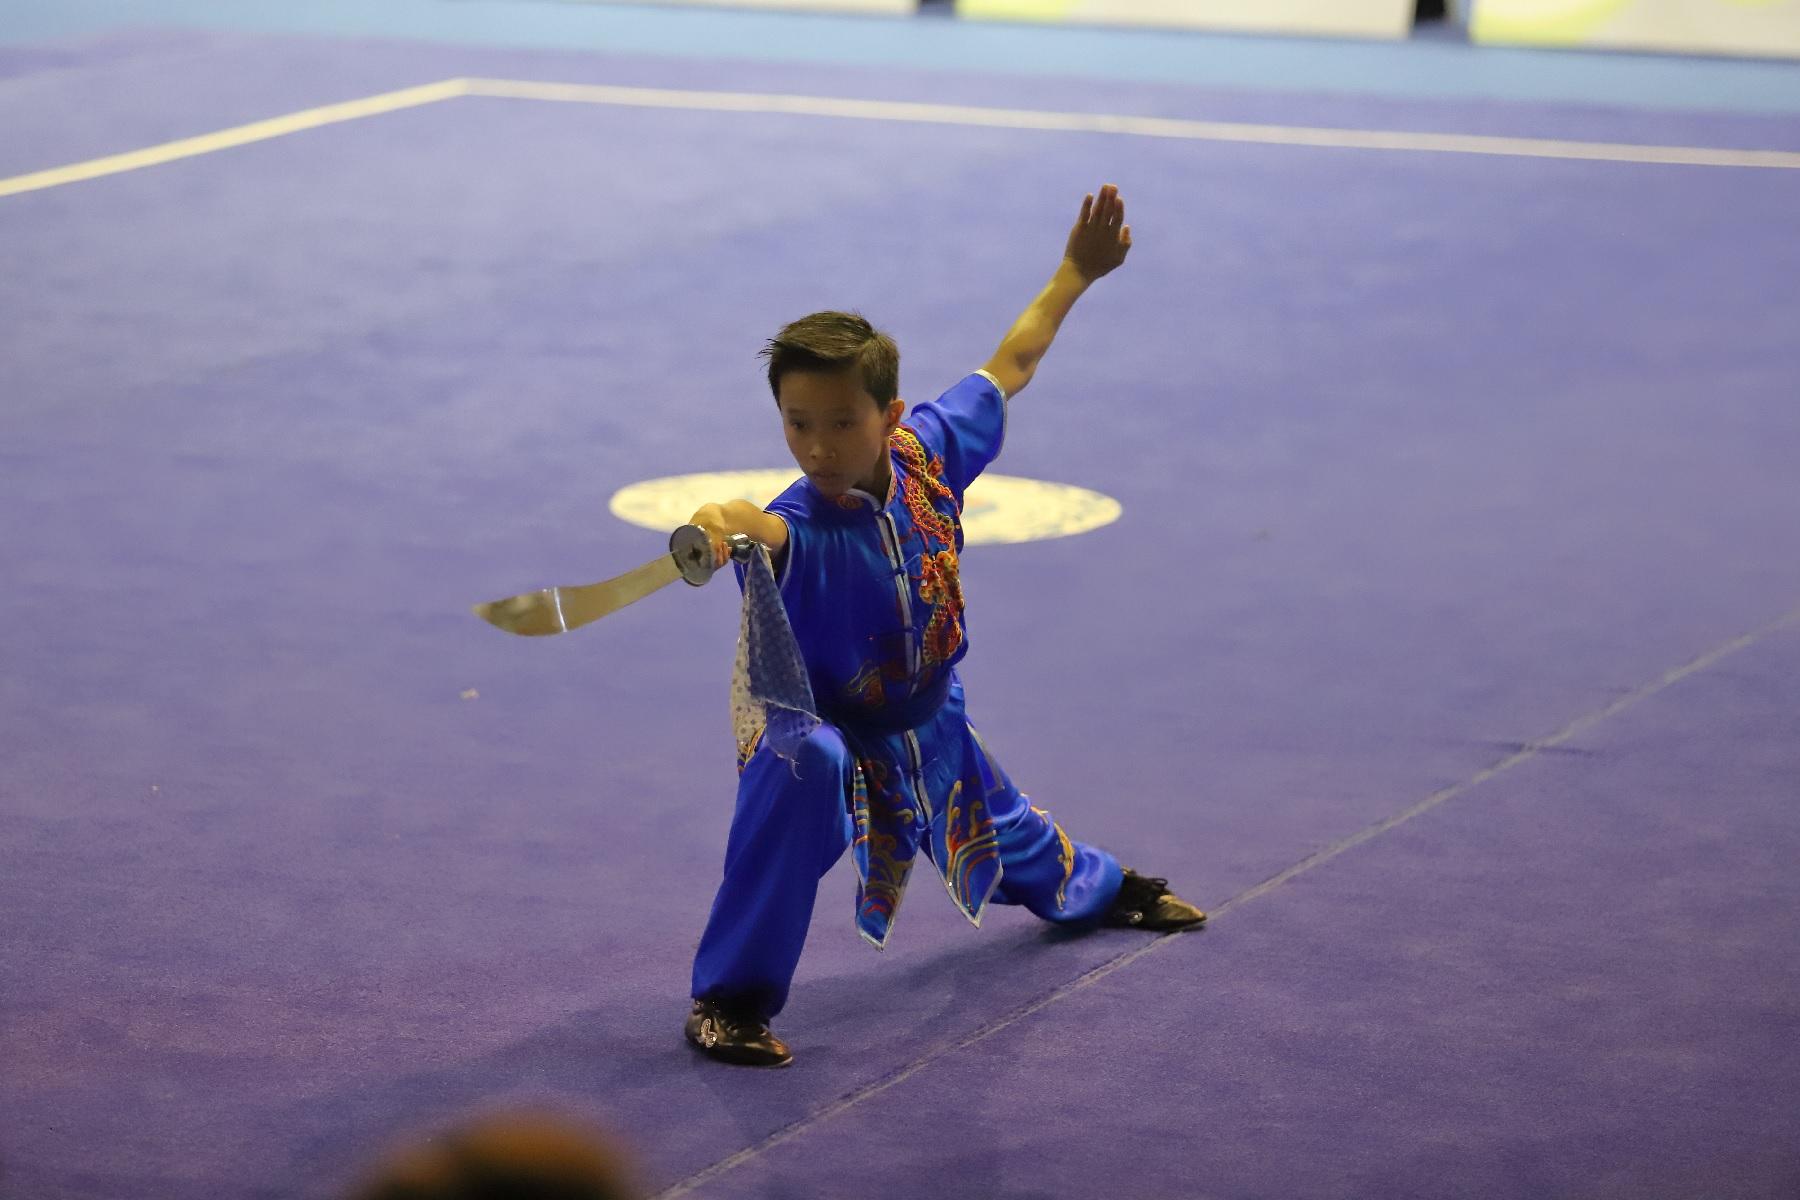 wayland-li-wushu-brazil-world-junior-wushu-championships-2018-team-canada-22.jpg